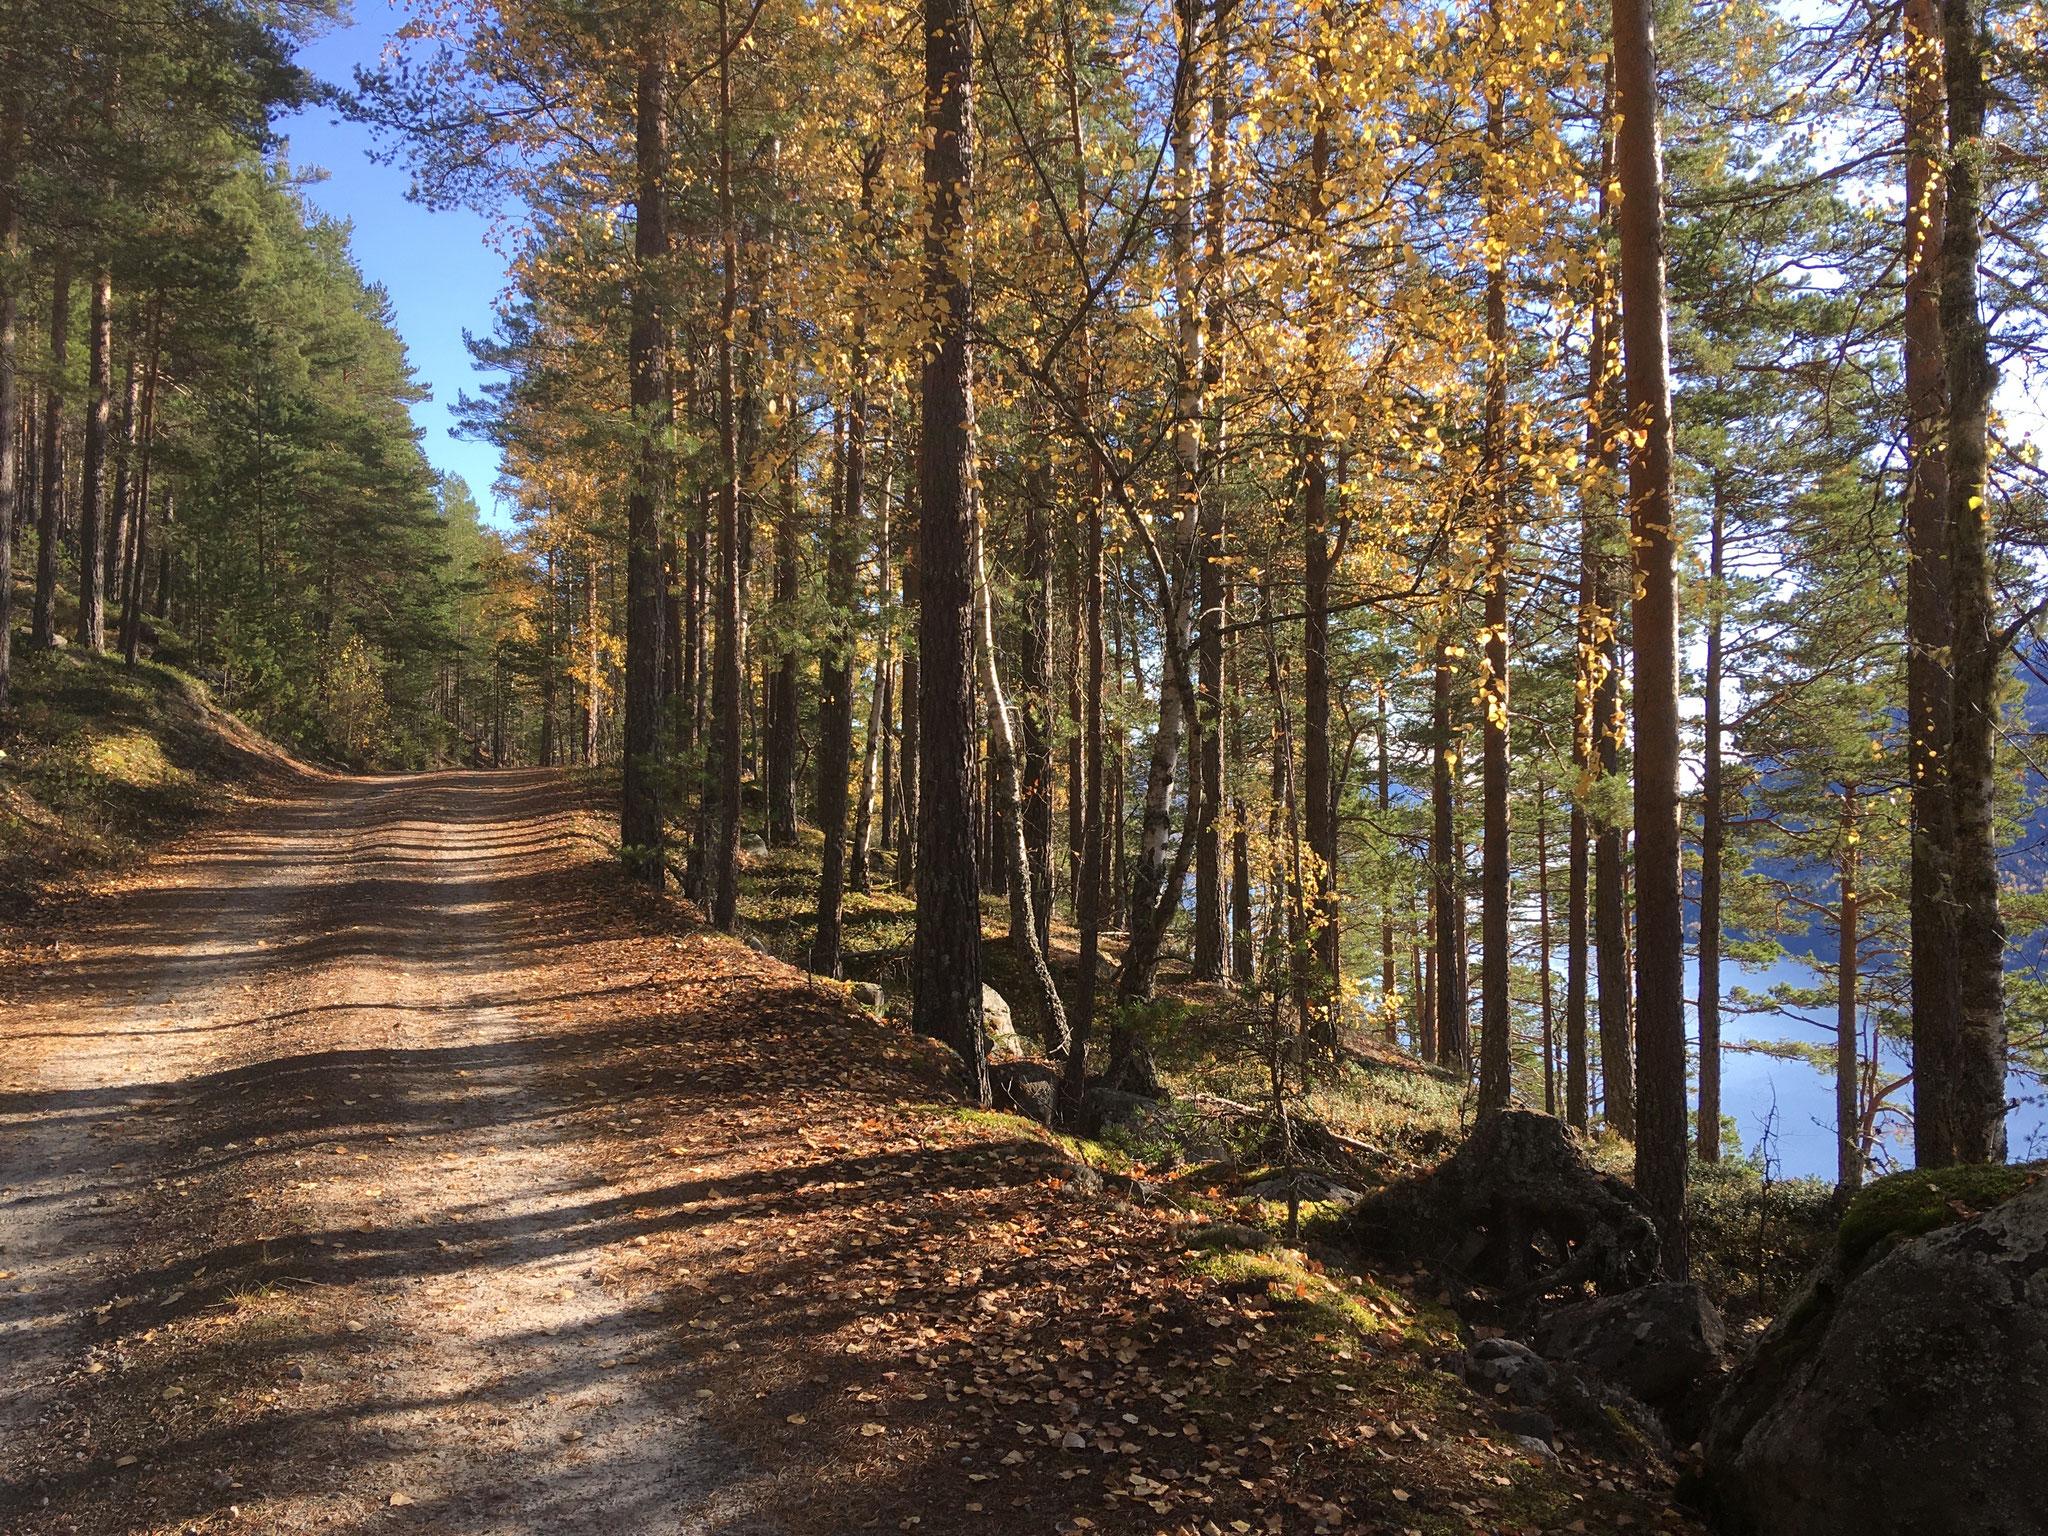 på skogsbilvei langs med Tinnsjøn